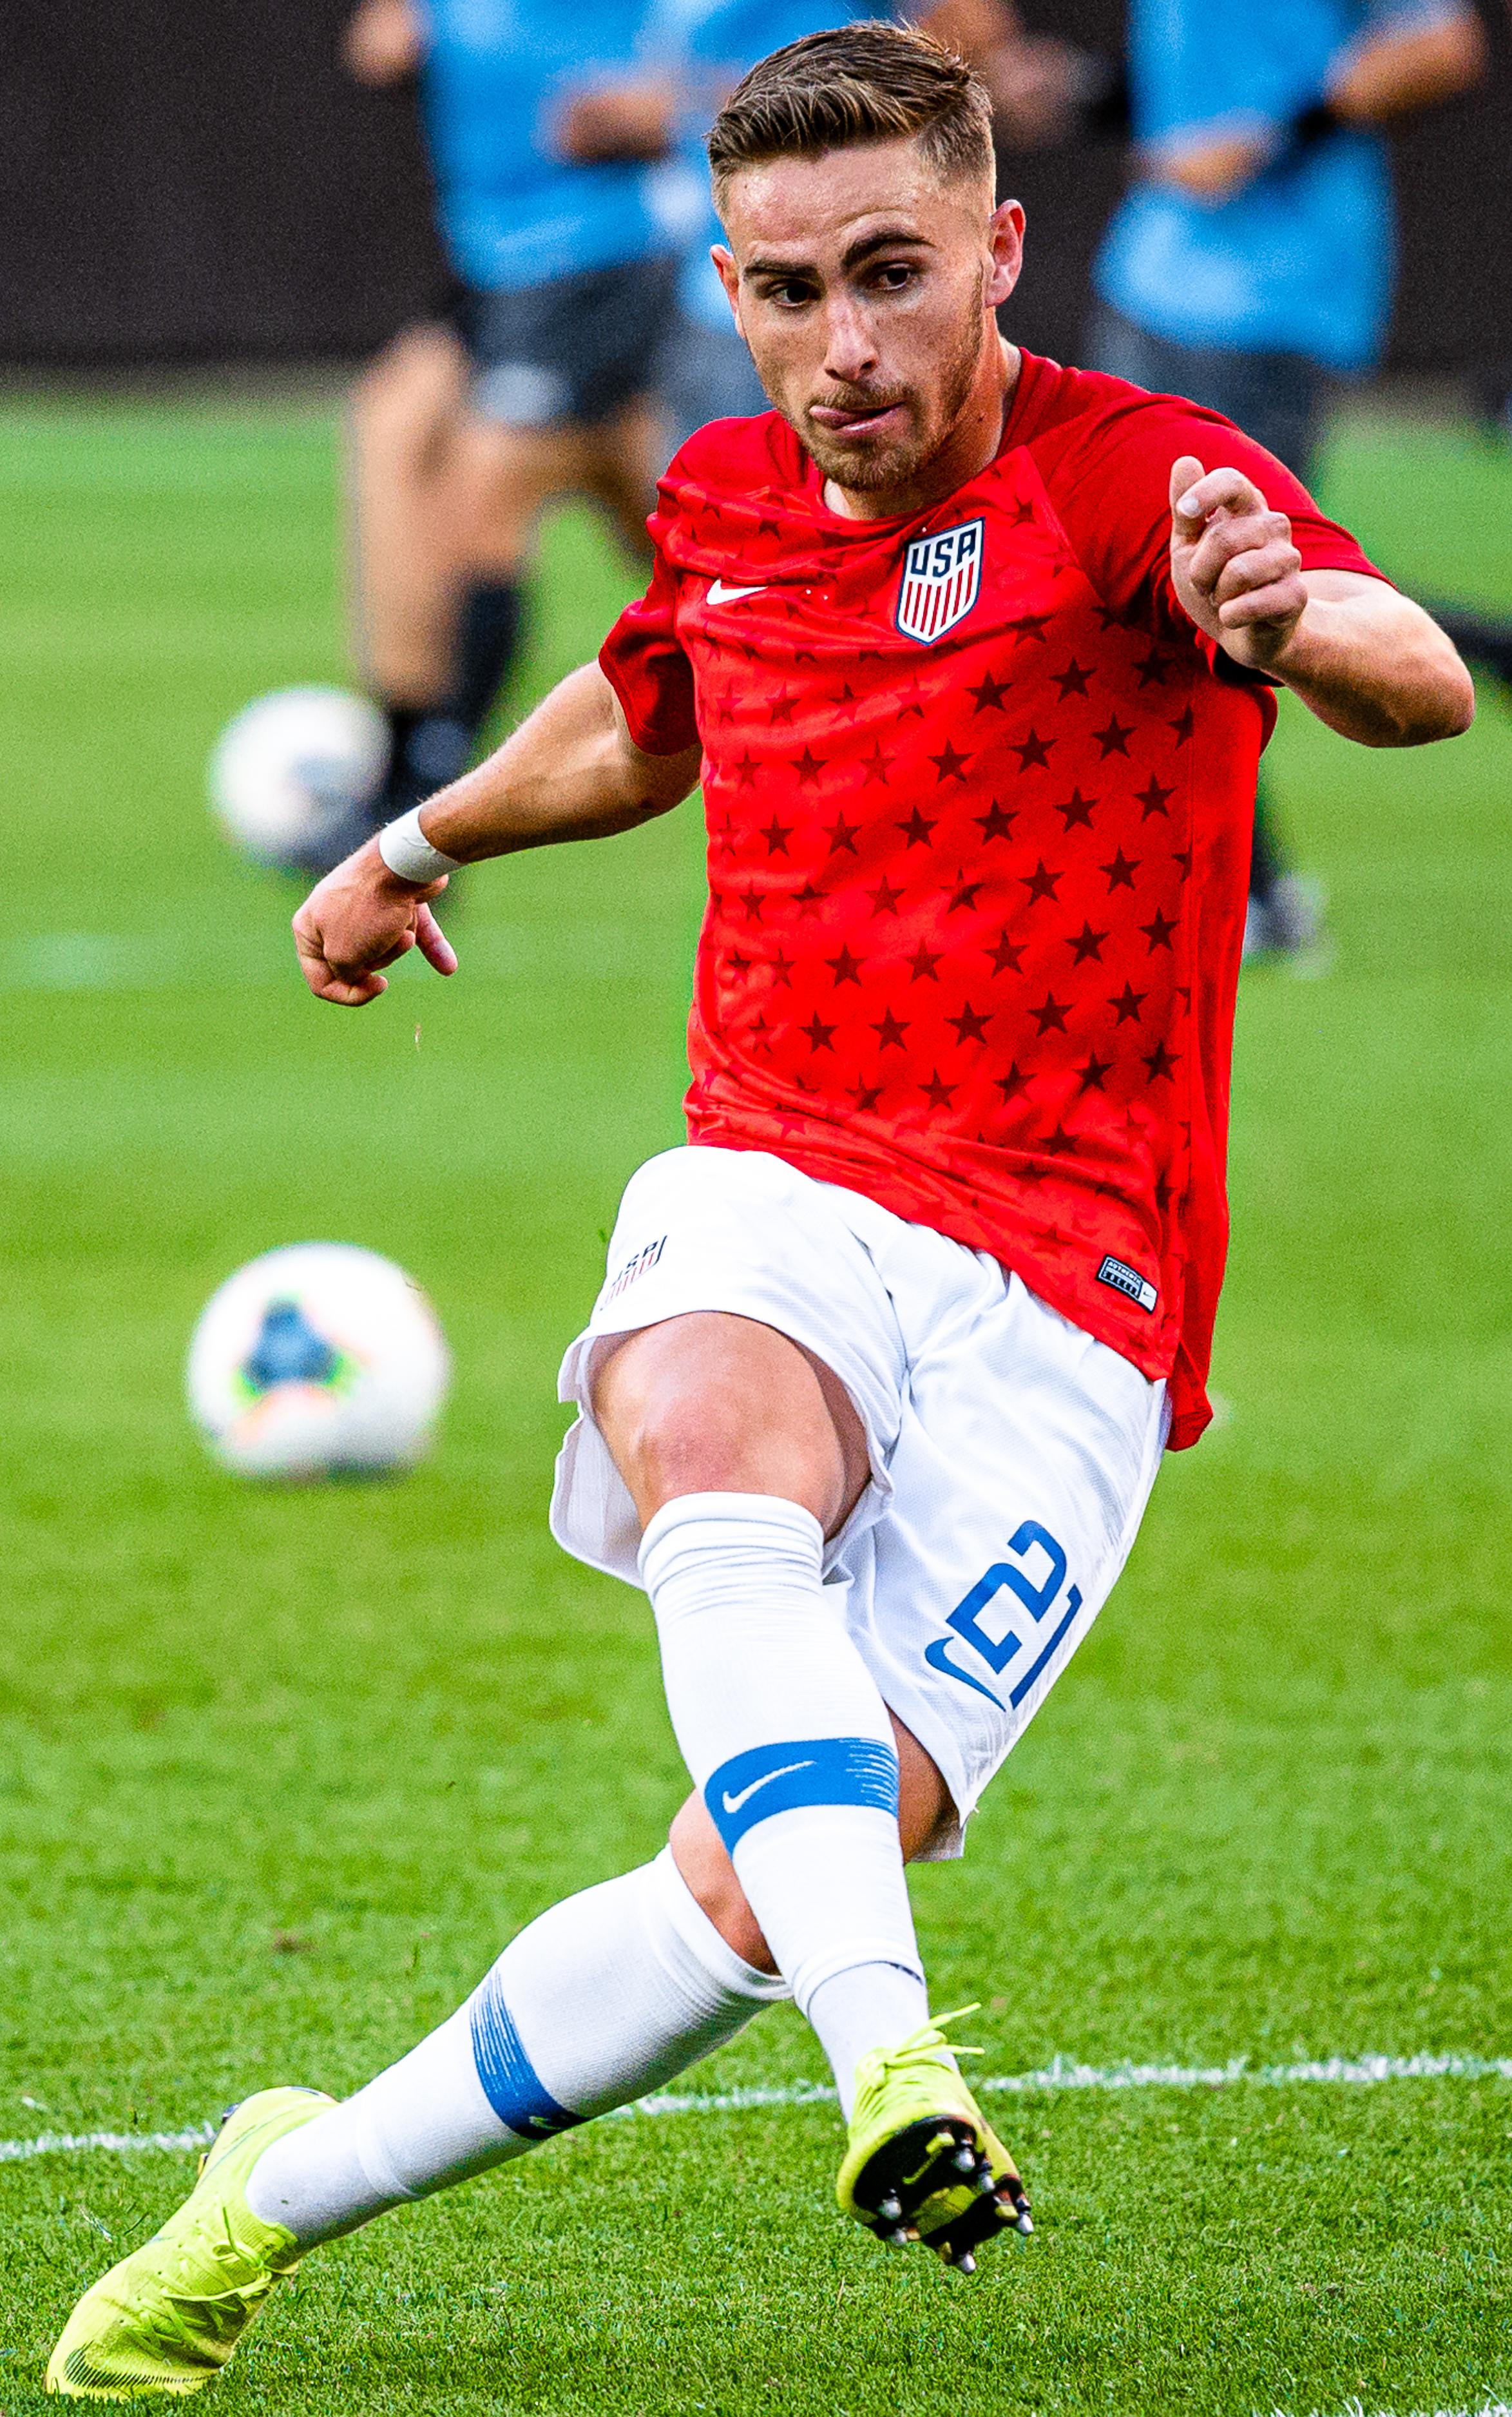 30 Best Futbol images   Club america, Soccer, Soccer players